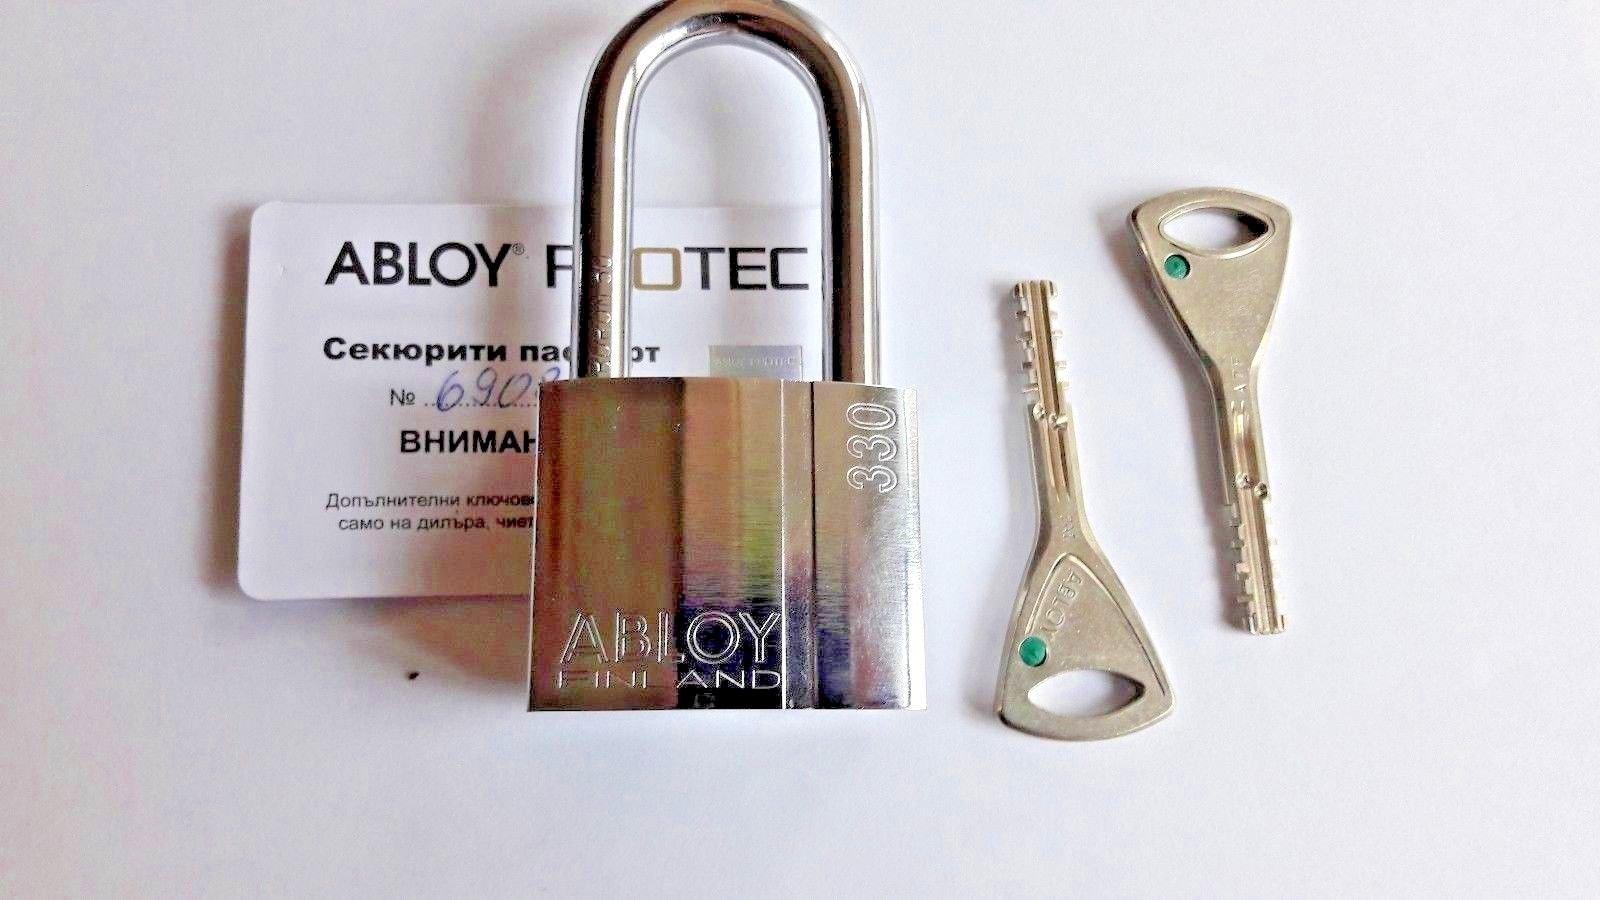 Abloy PROTEC Padlock PL 330 - 25/50/100mm Shackle - 2 Keys - Reinforced Heavy Duty Padlock - Bike Lock by Abloy (50 mm shackle)